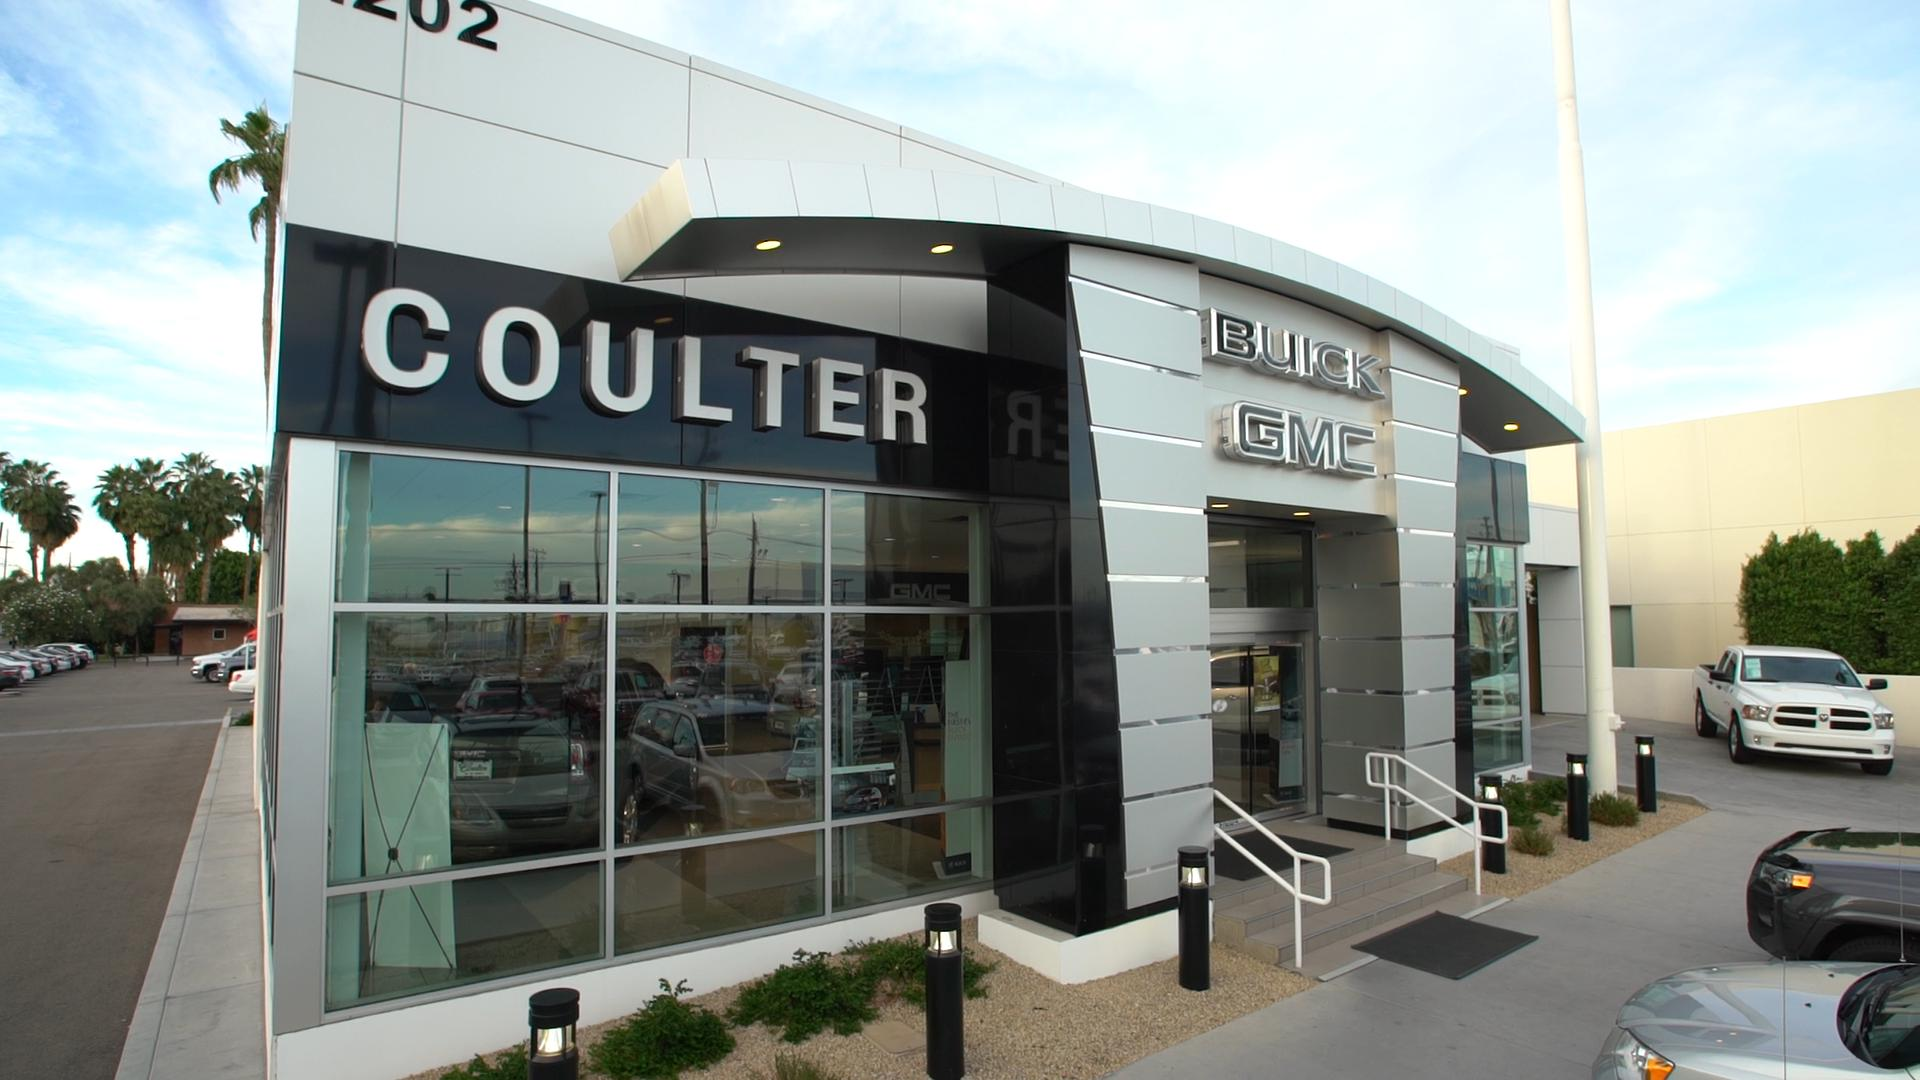 Coulter Buick Gmc Phoenix Phoenix Arizona Az Localdatabase Com